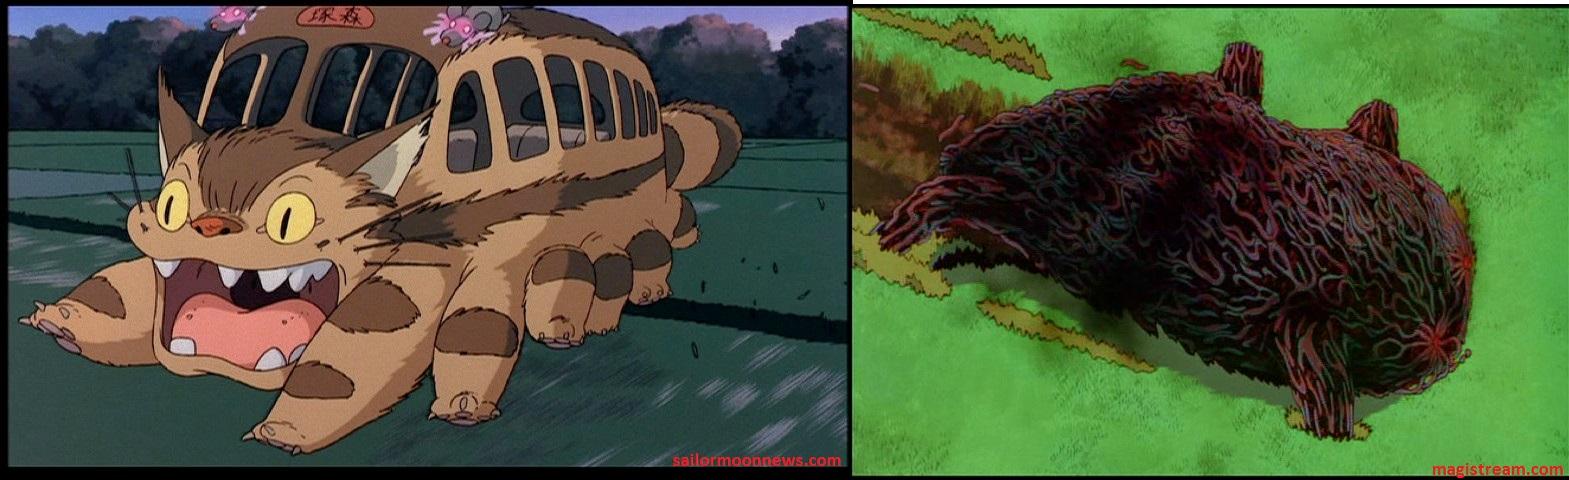 Catbus vs demon boar